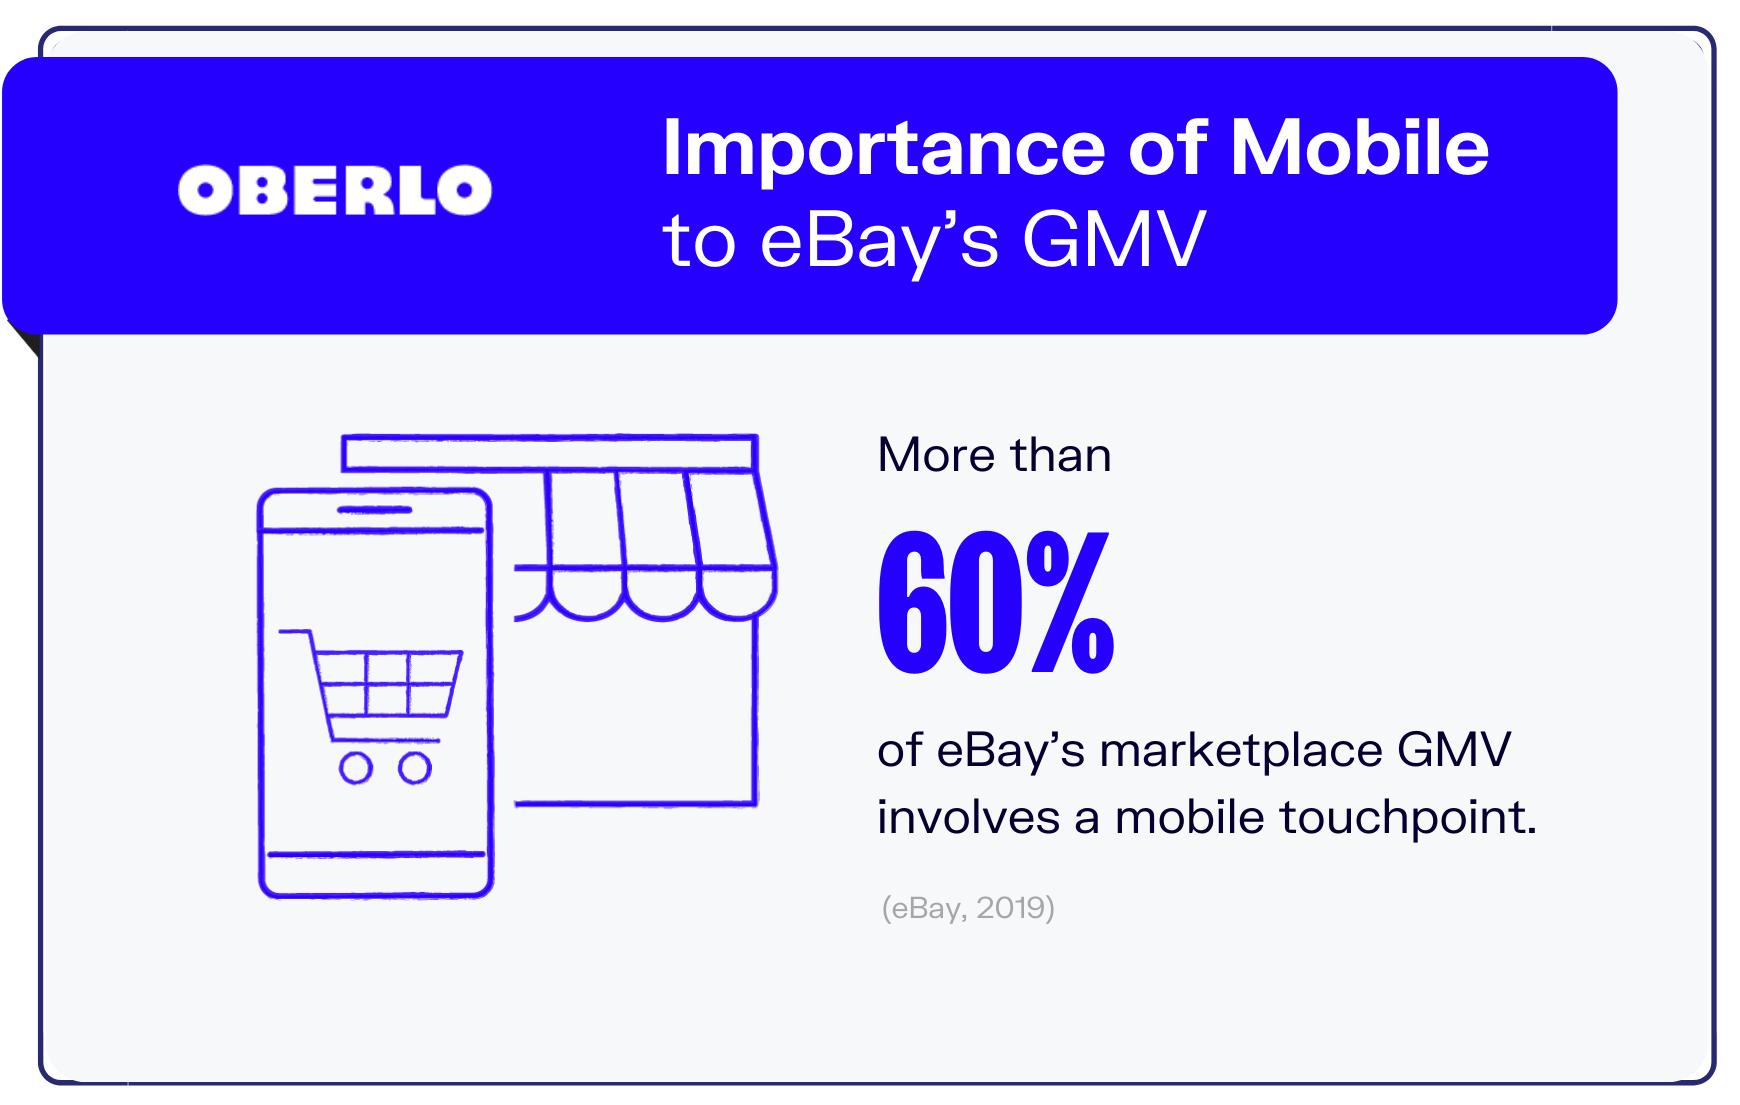 ebay statistics graphic 6